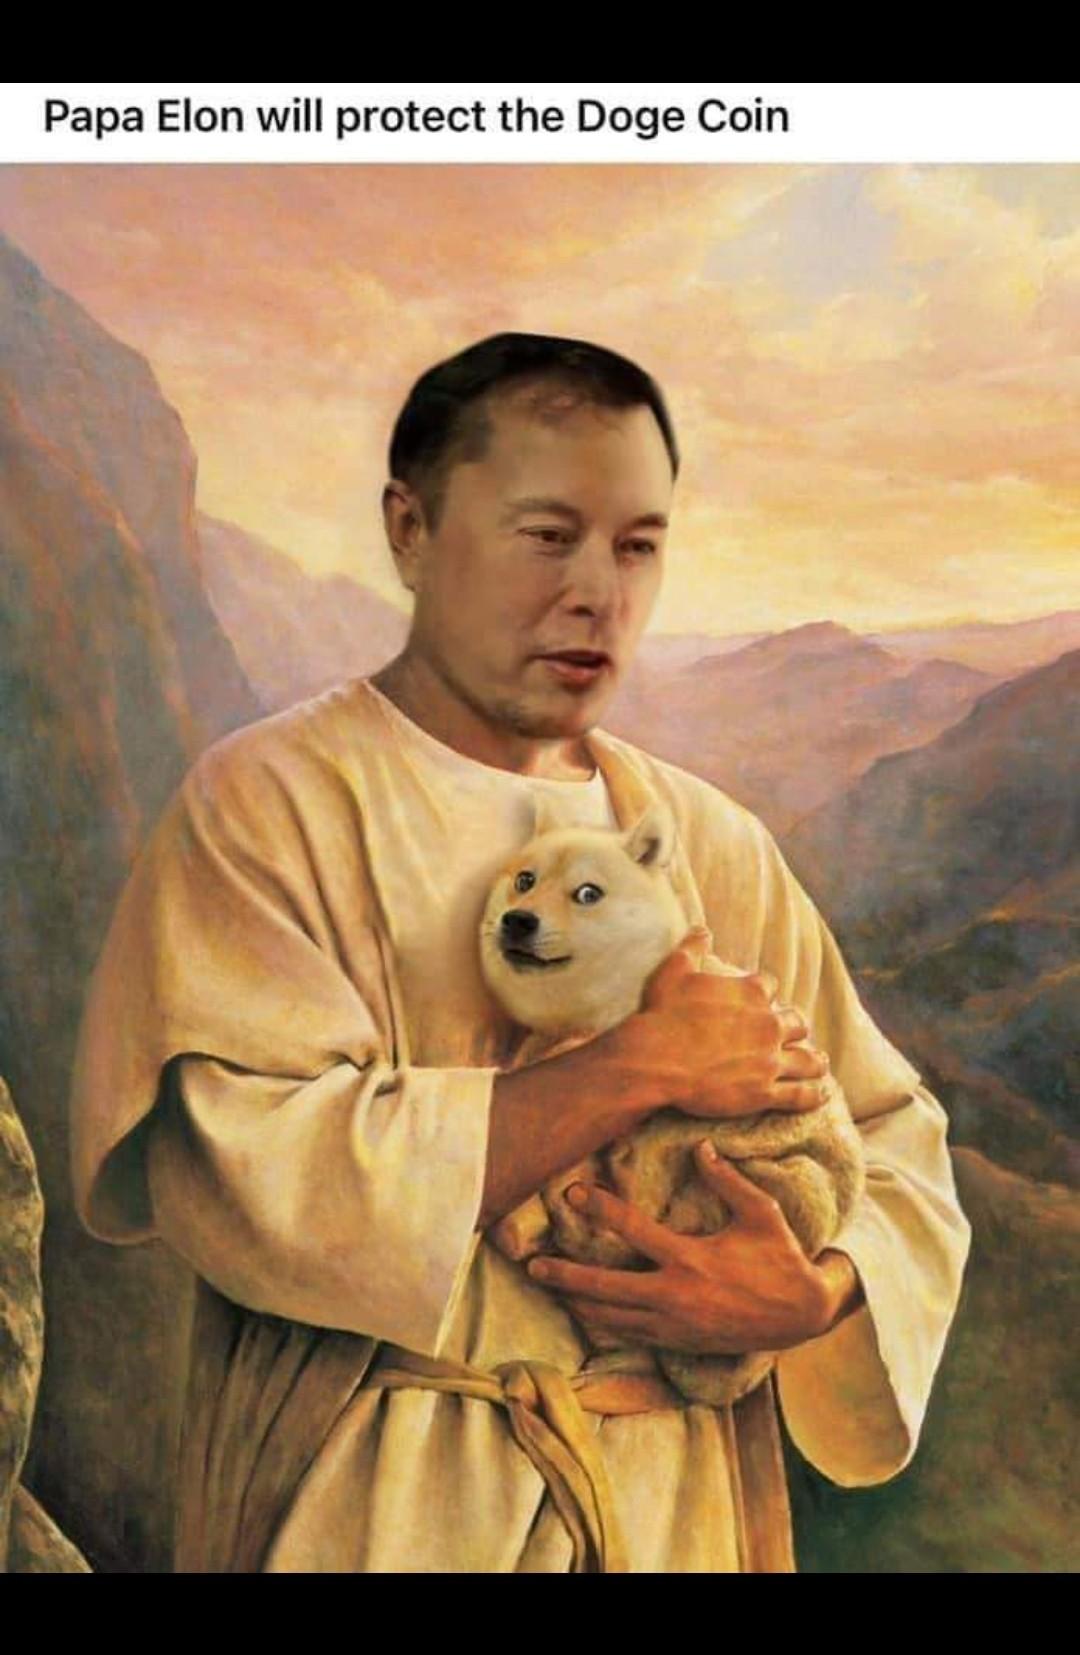 Dogecoin - meme